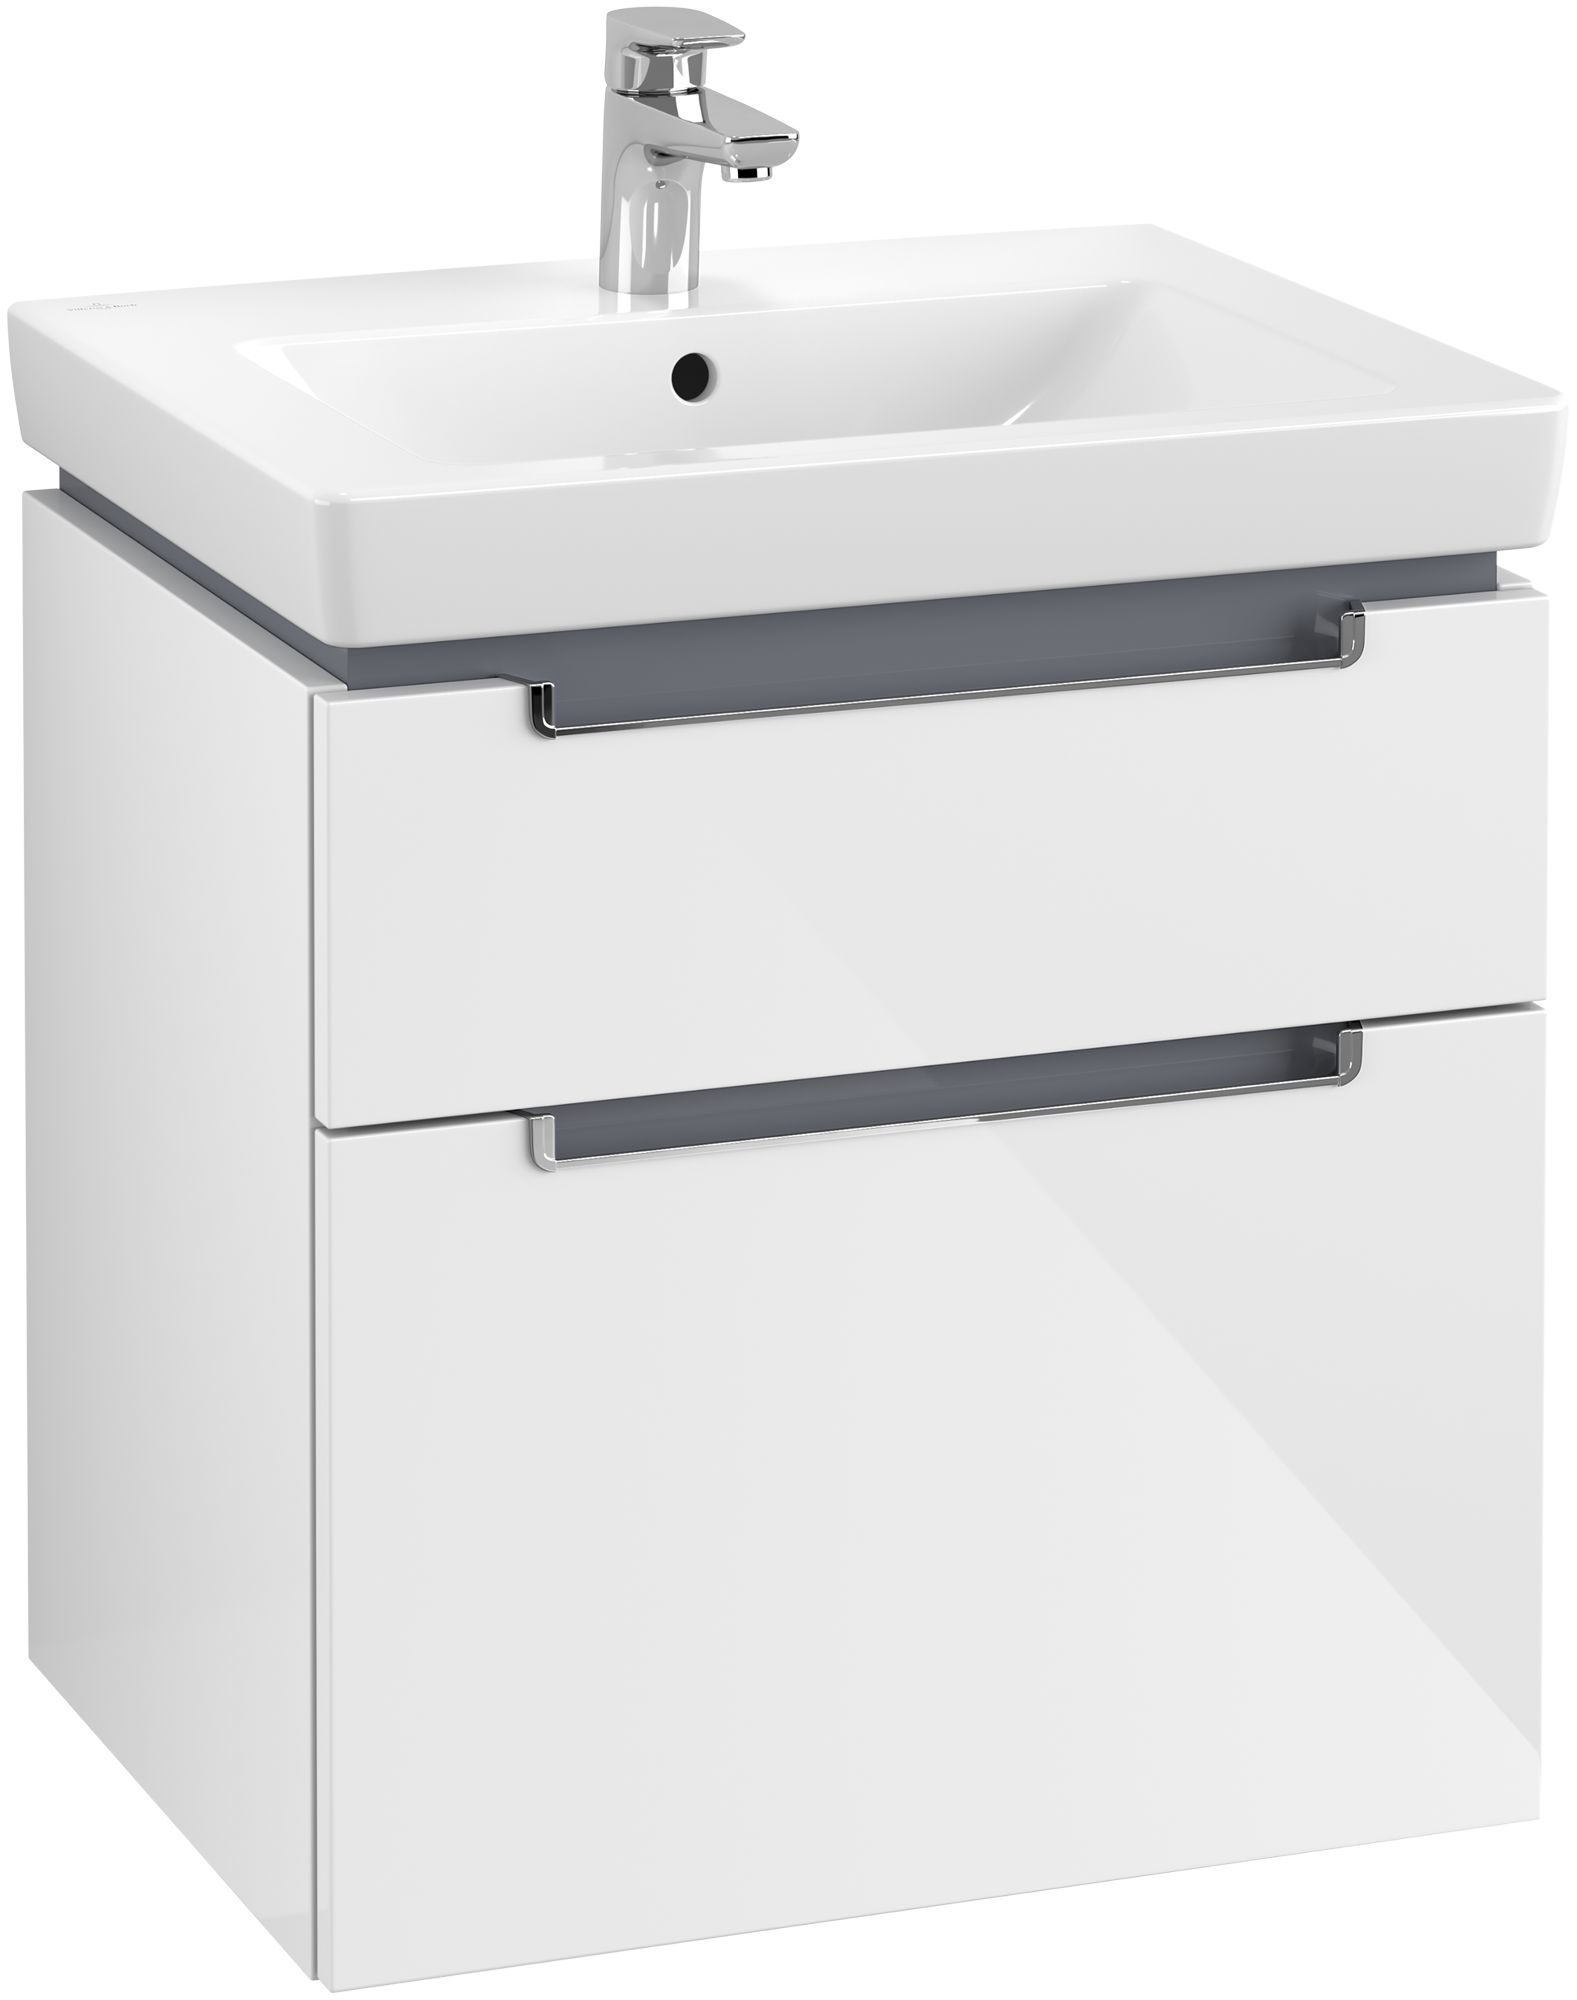 Villeroy & Boch Subway 2.0 Waschtischunterschrank 2 Auszüge B:587xT:454xH:590mm glossy weiß Griffe chrom A90910DH